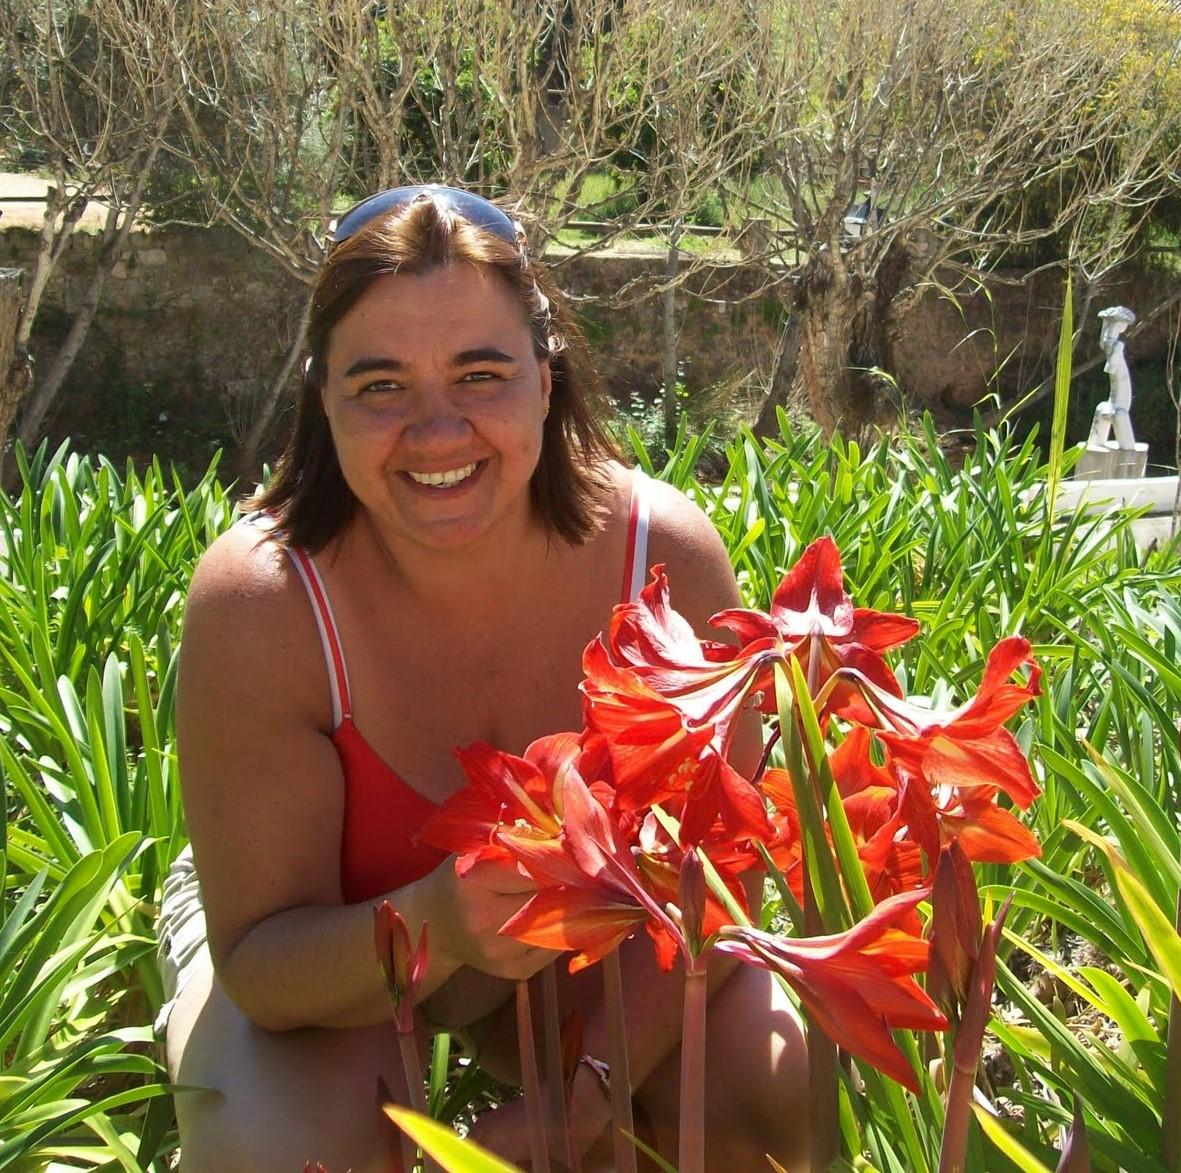 Formula Botanica Graduate - Clivina Wills